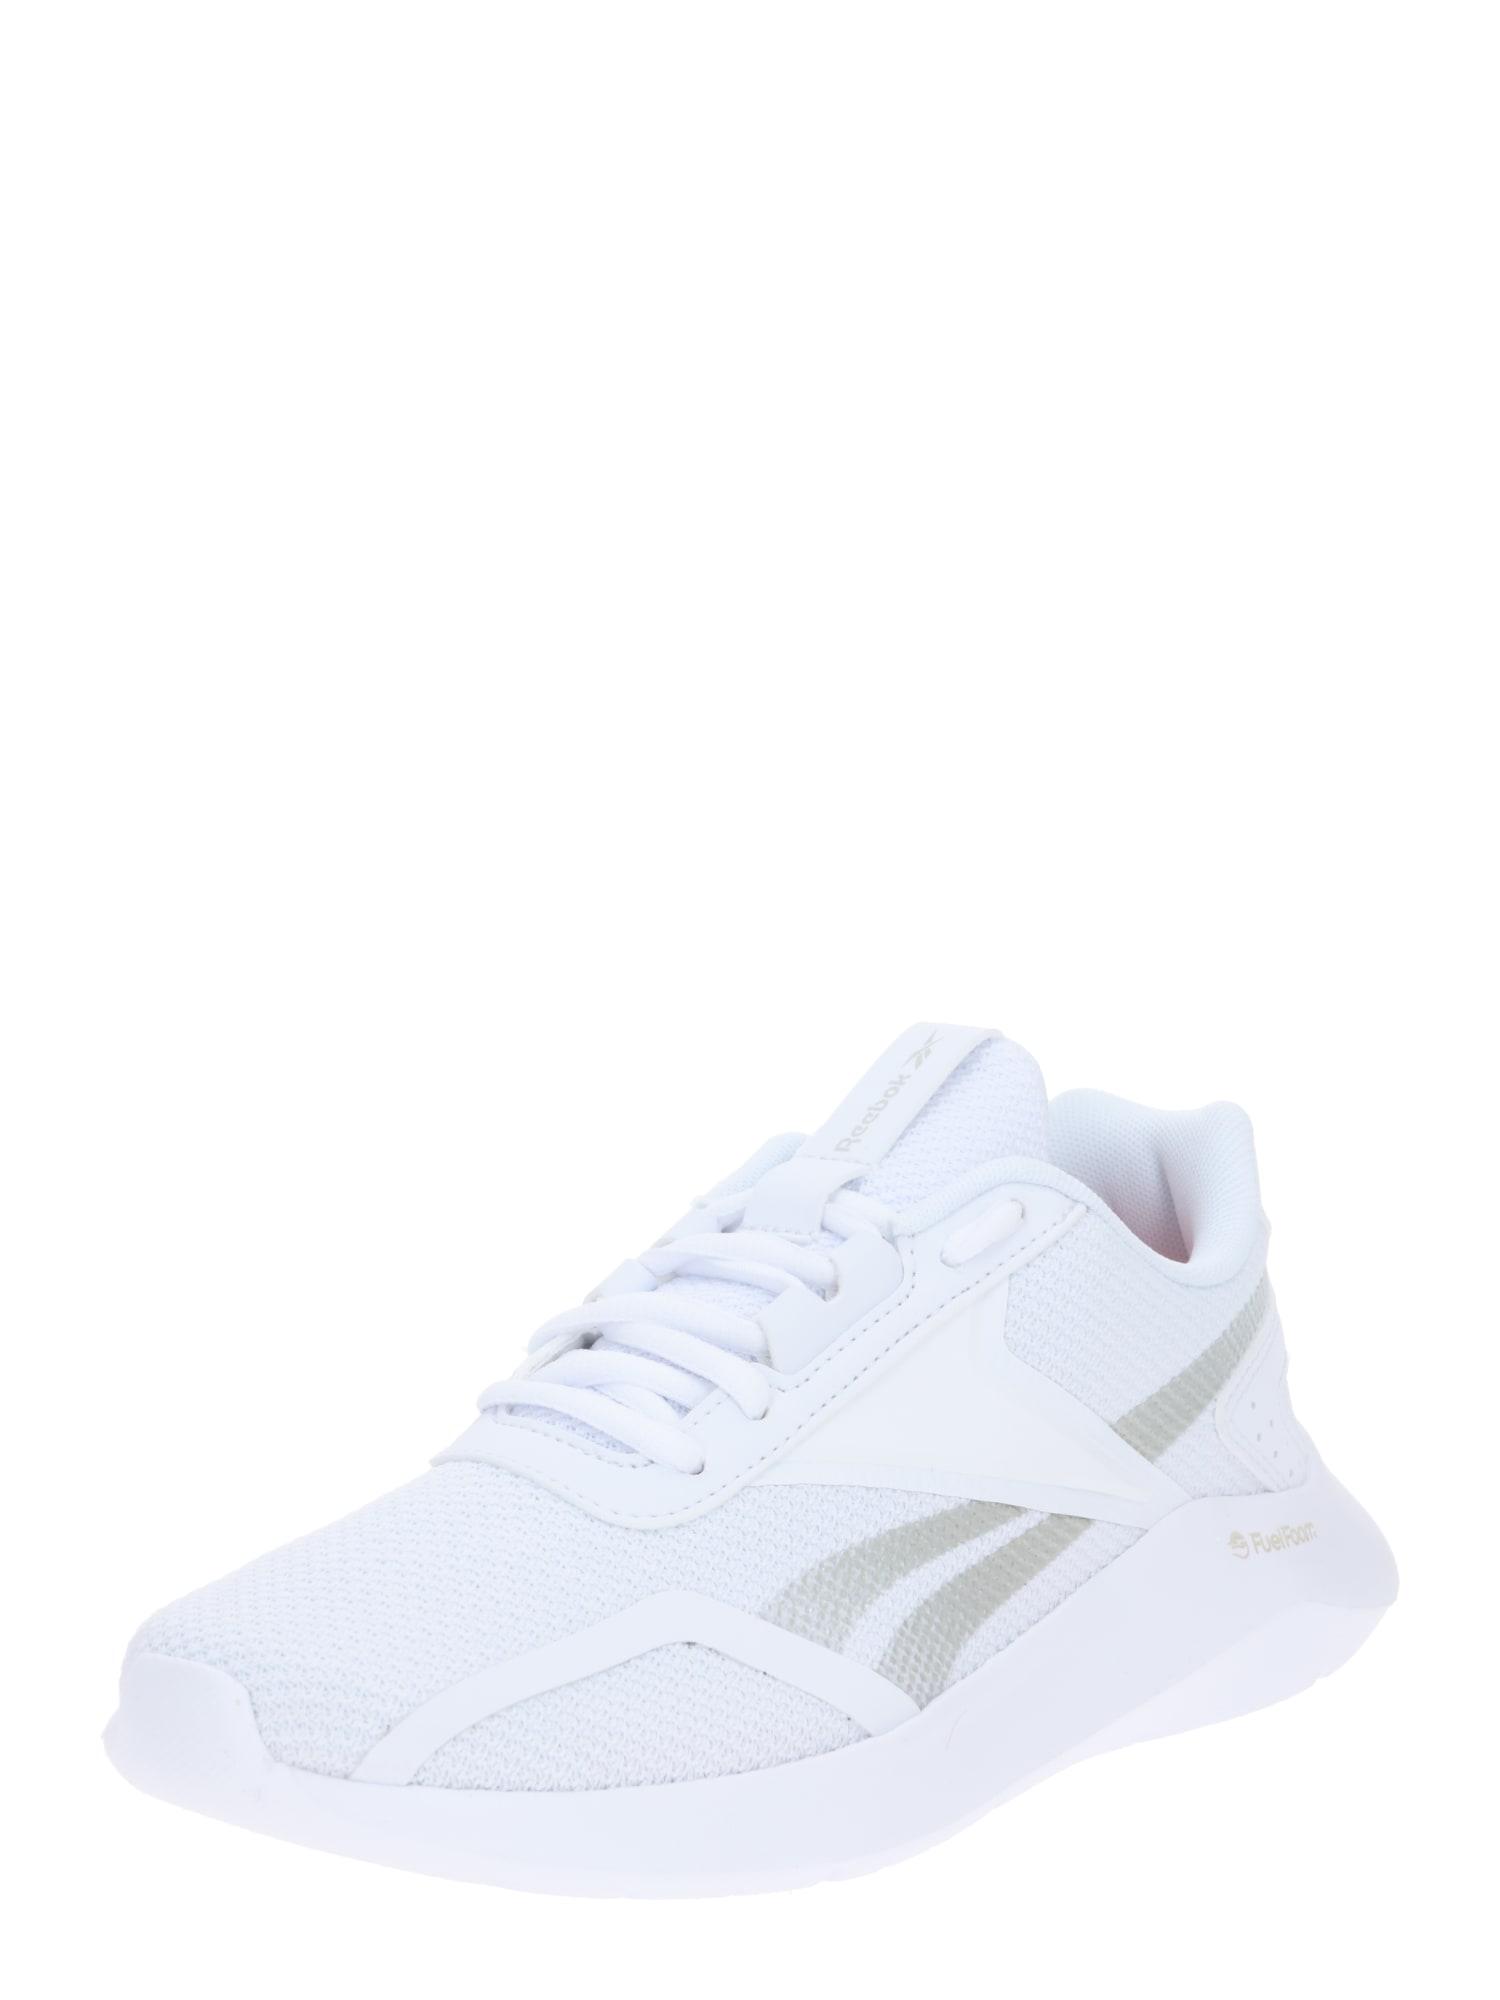 REEBOK Chaussure de course 'Energylux 2.0'  - Blanc - Taille: 37 - female